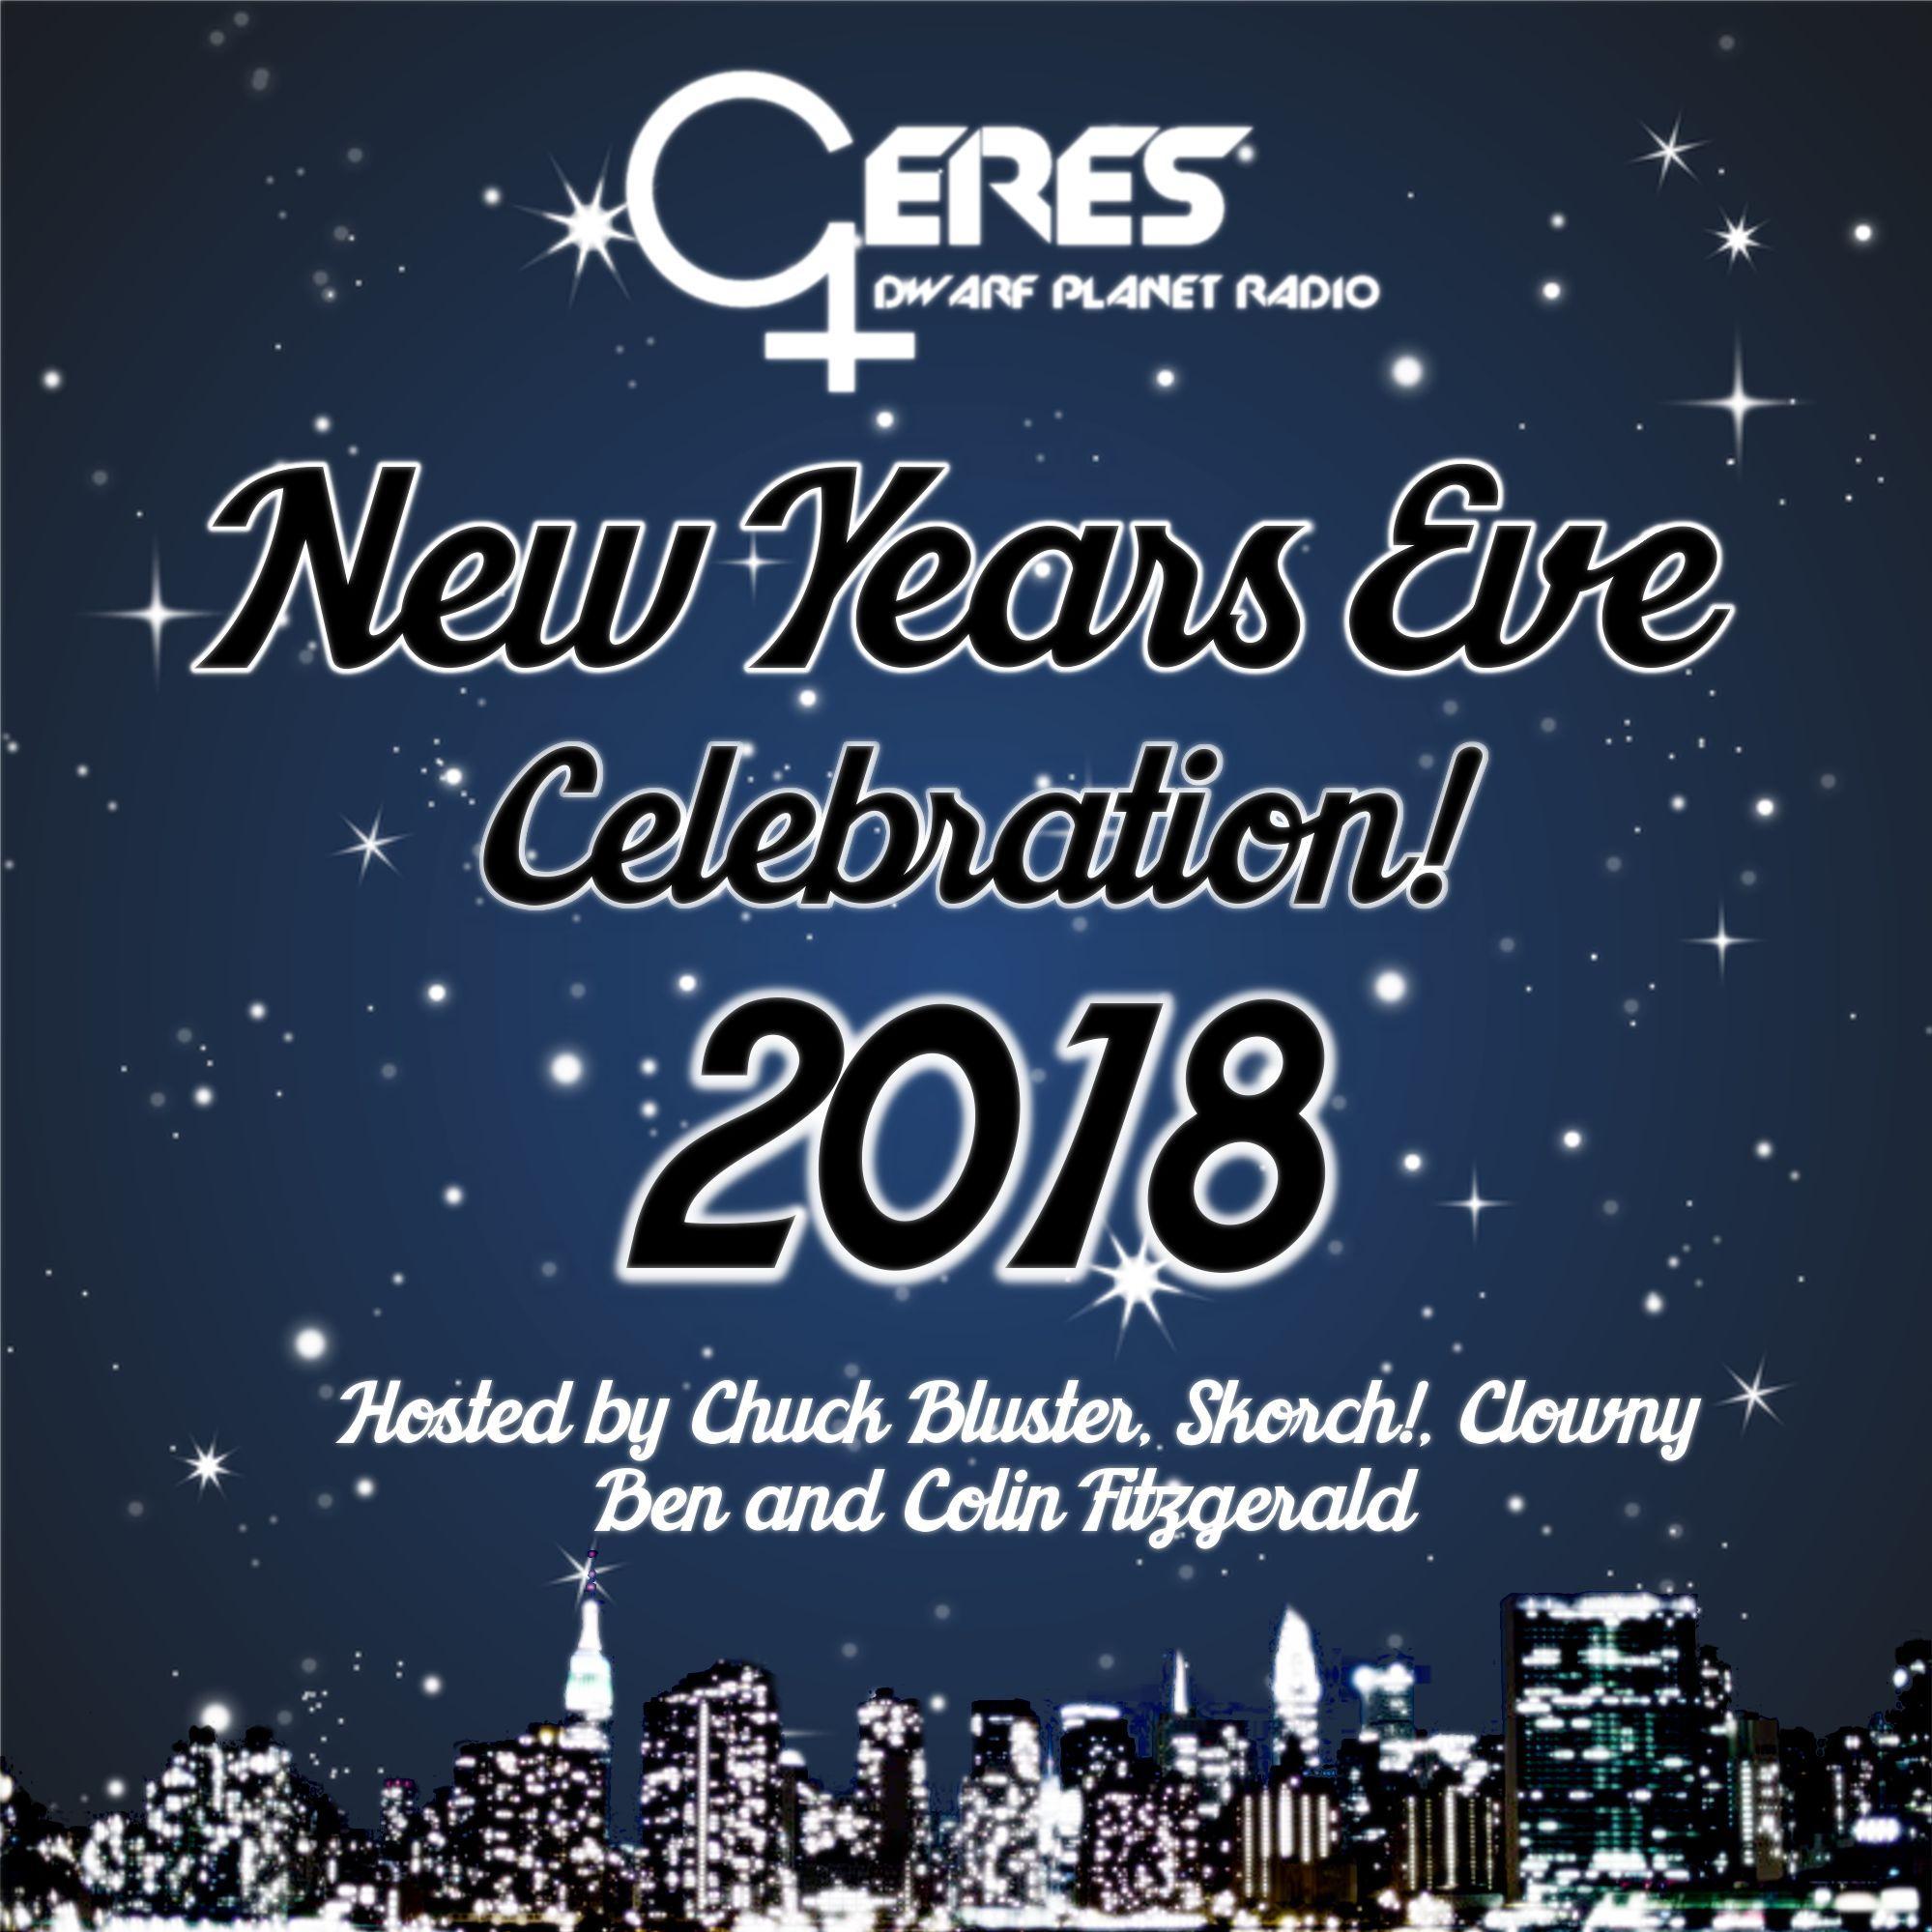 Ceres Dwarf Planet Radio New Year's Eve Celebration 2018!